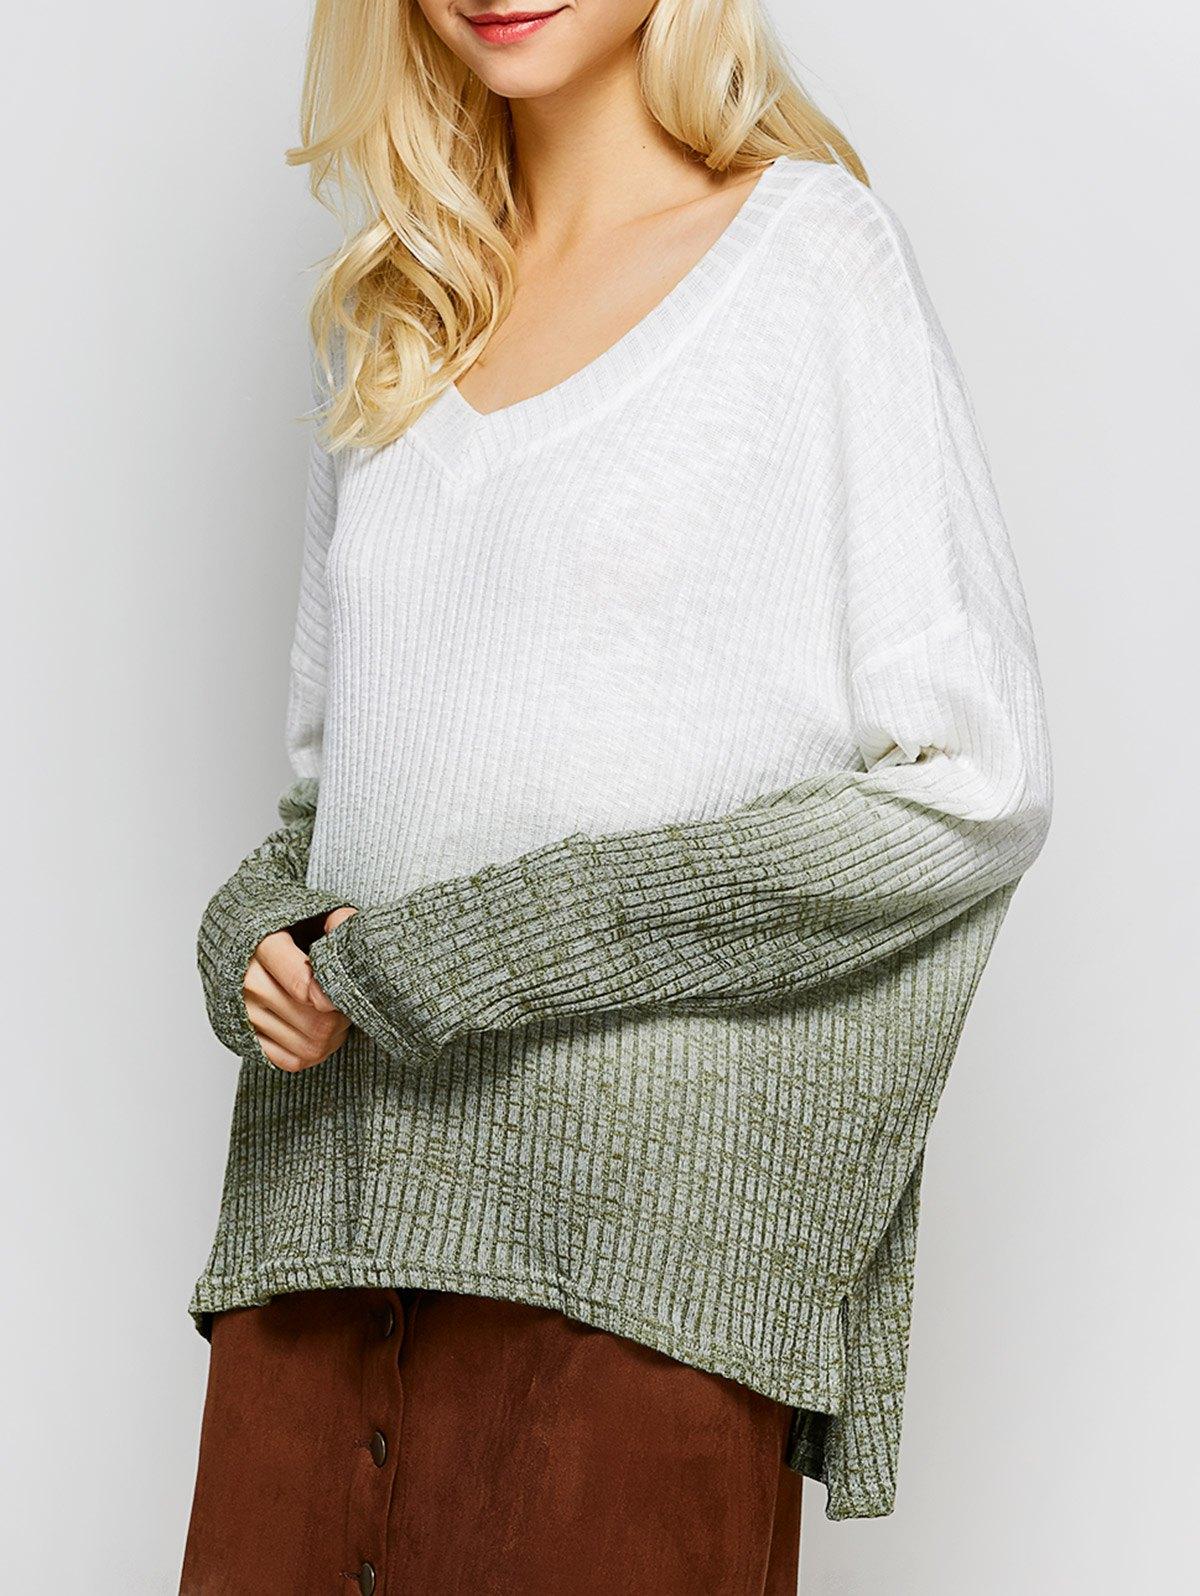 High-Low Ombre Knitwear